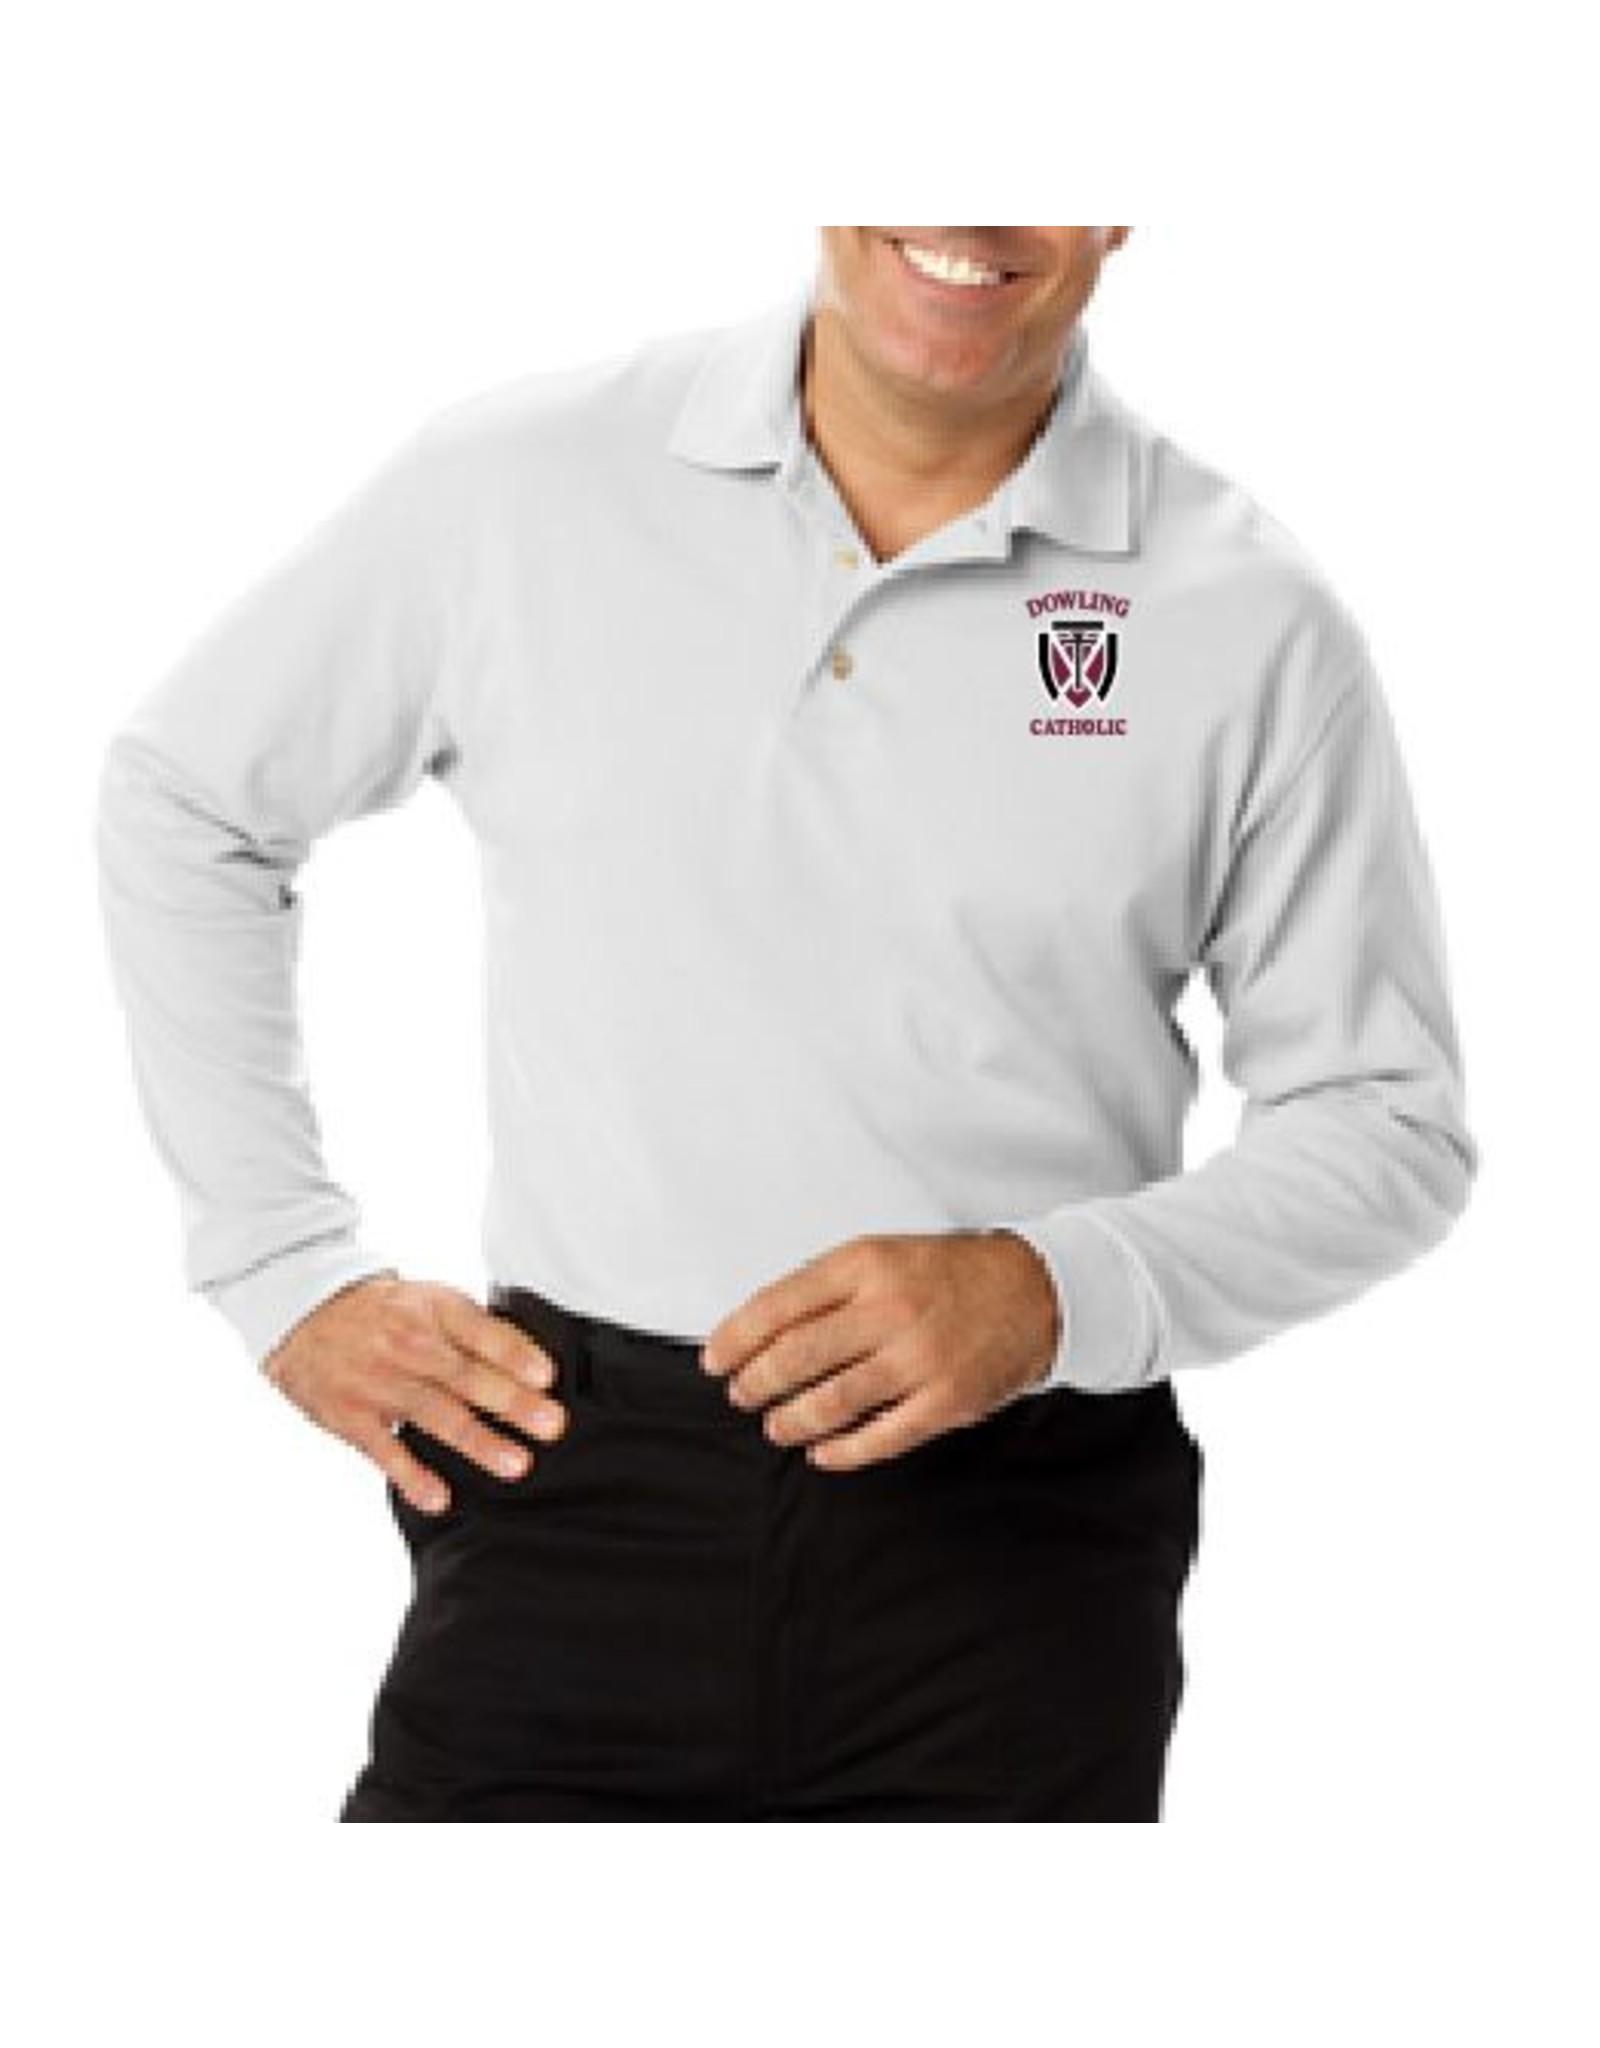 Blue Generation Men's Long Sleeve Cotton Polo - ONLINE